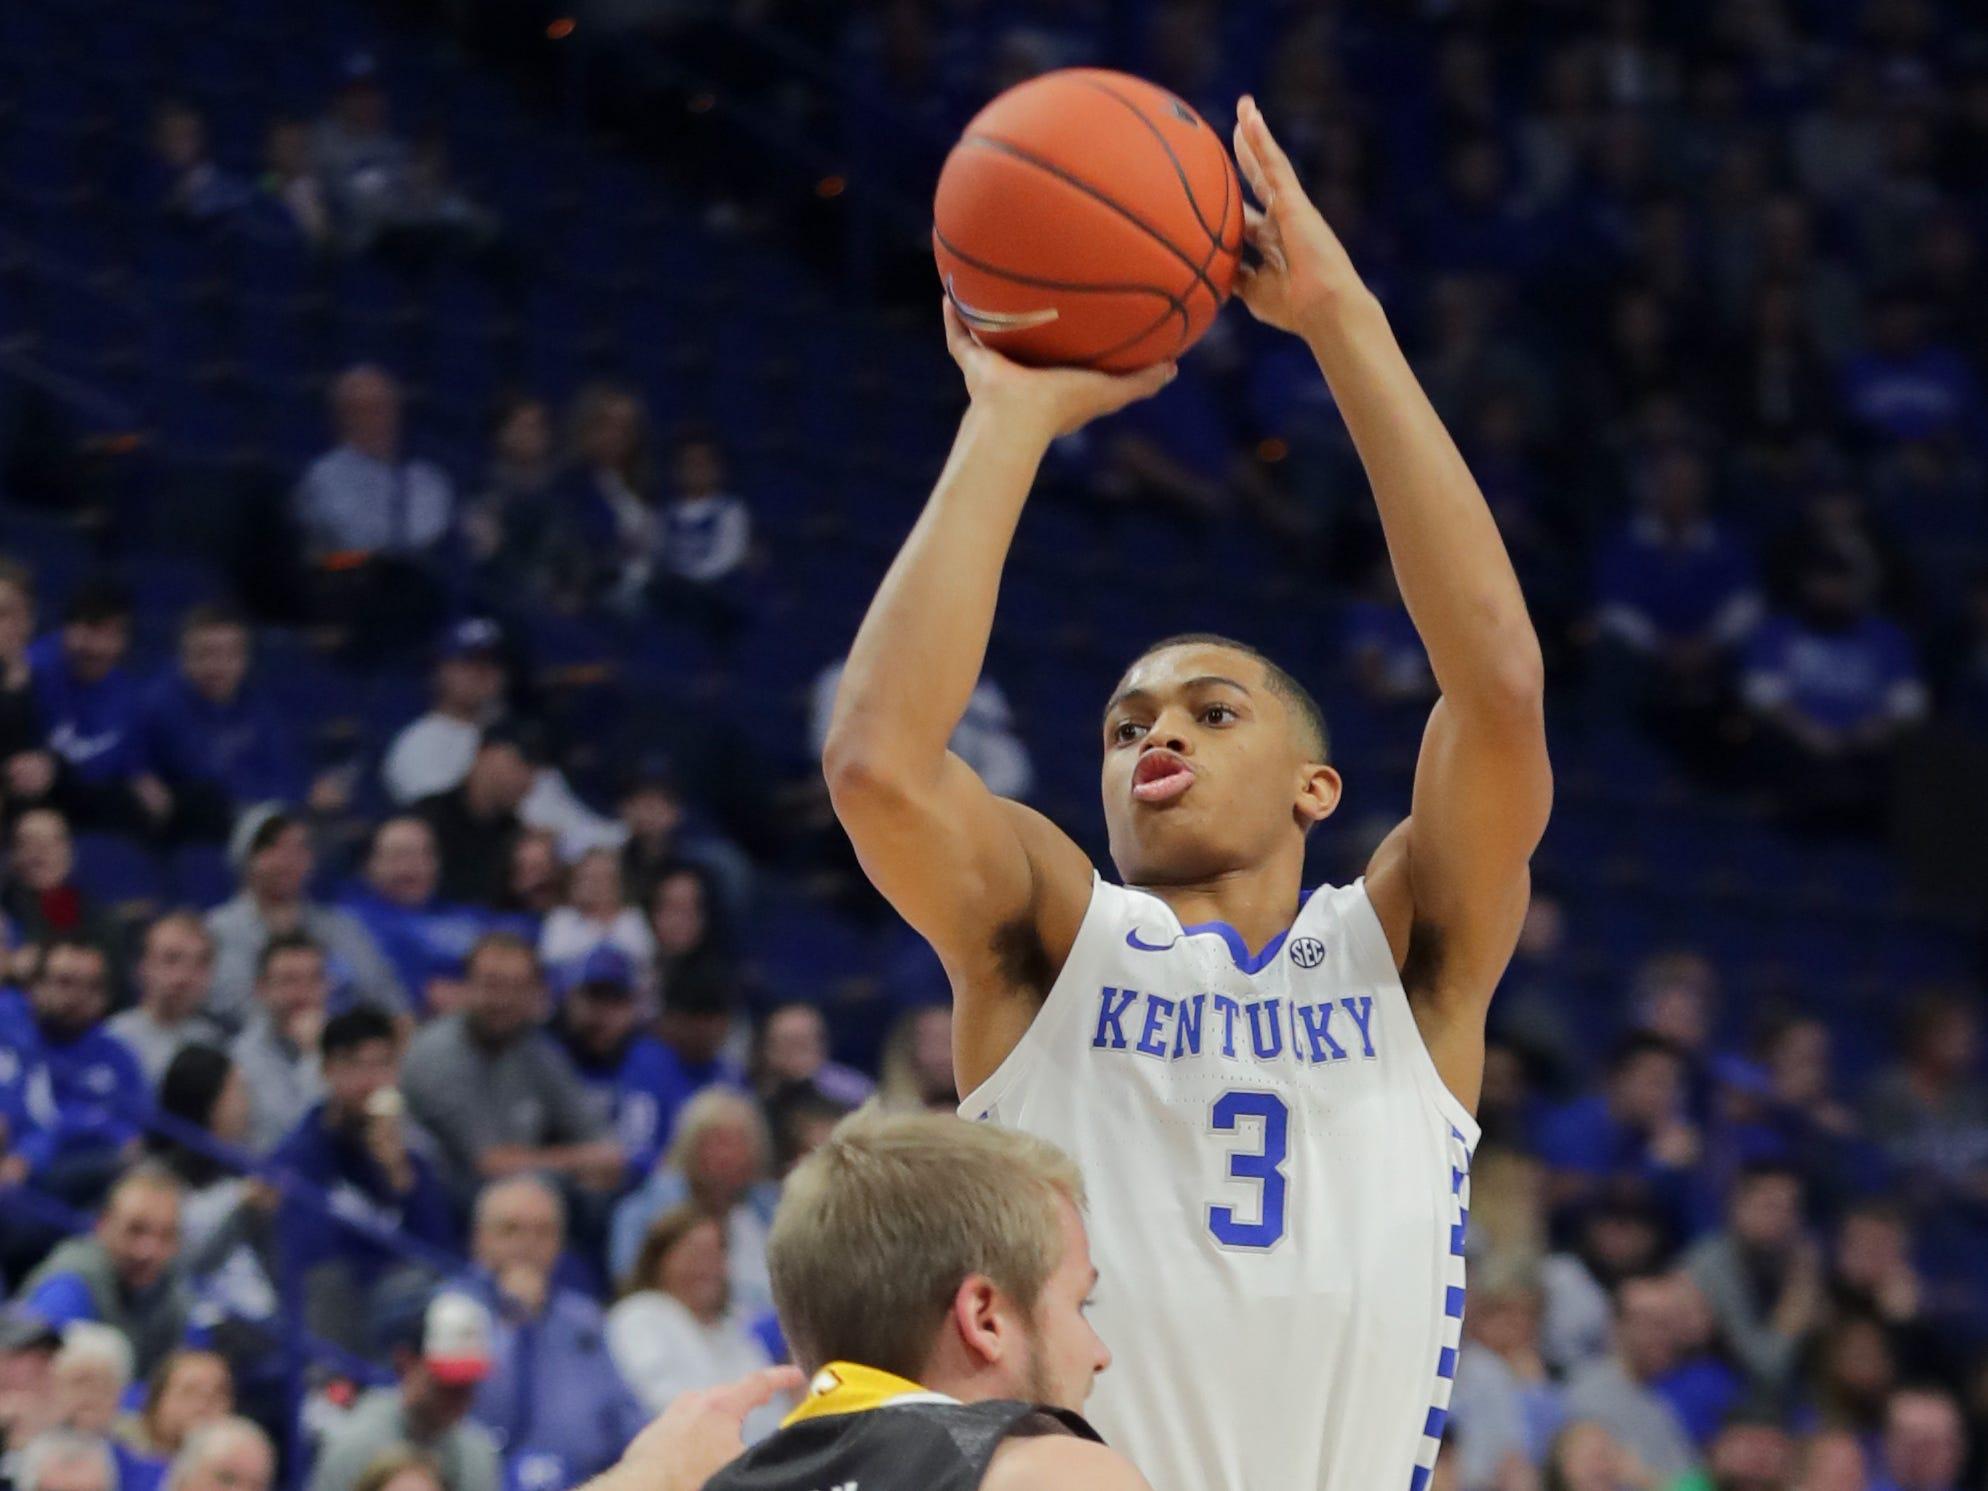 Kentucky's P.J. Washington scores over Winthrop's Bjorn Browan.  Nov. 21, 2018